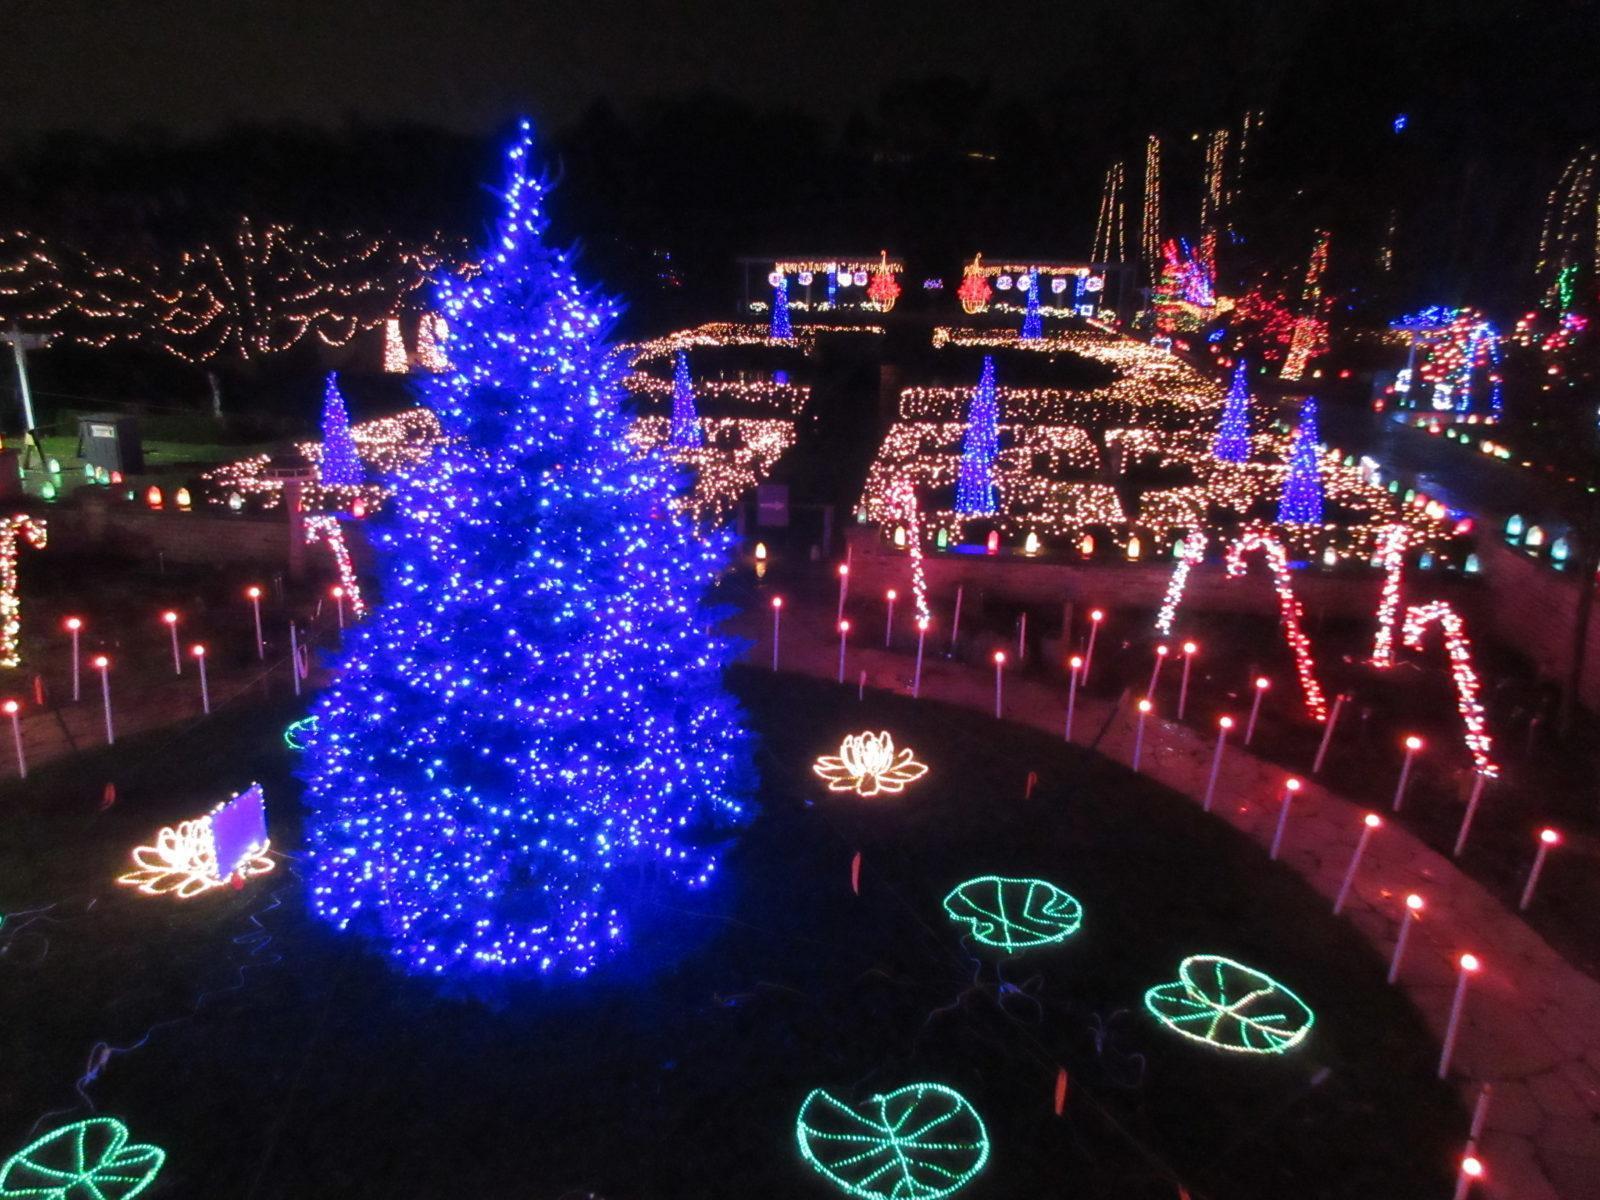 janesvillecreditmarkdwyer - Holiday Light Show Rotary Botanical Gardens December 22